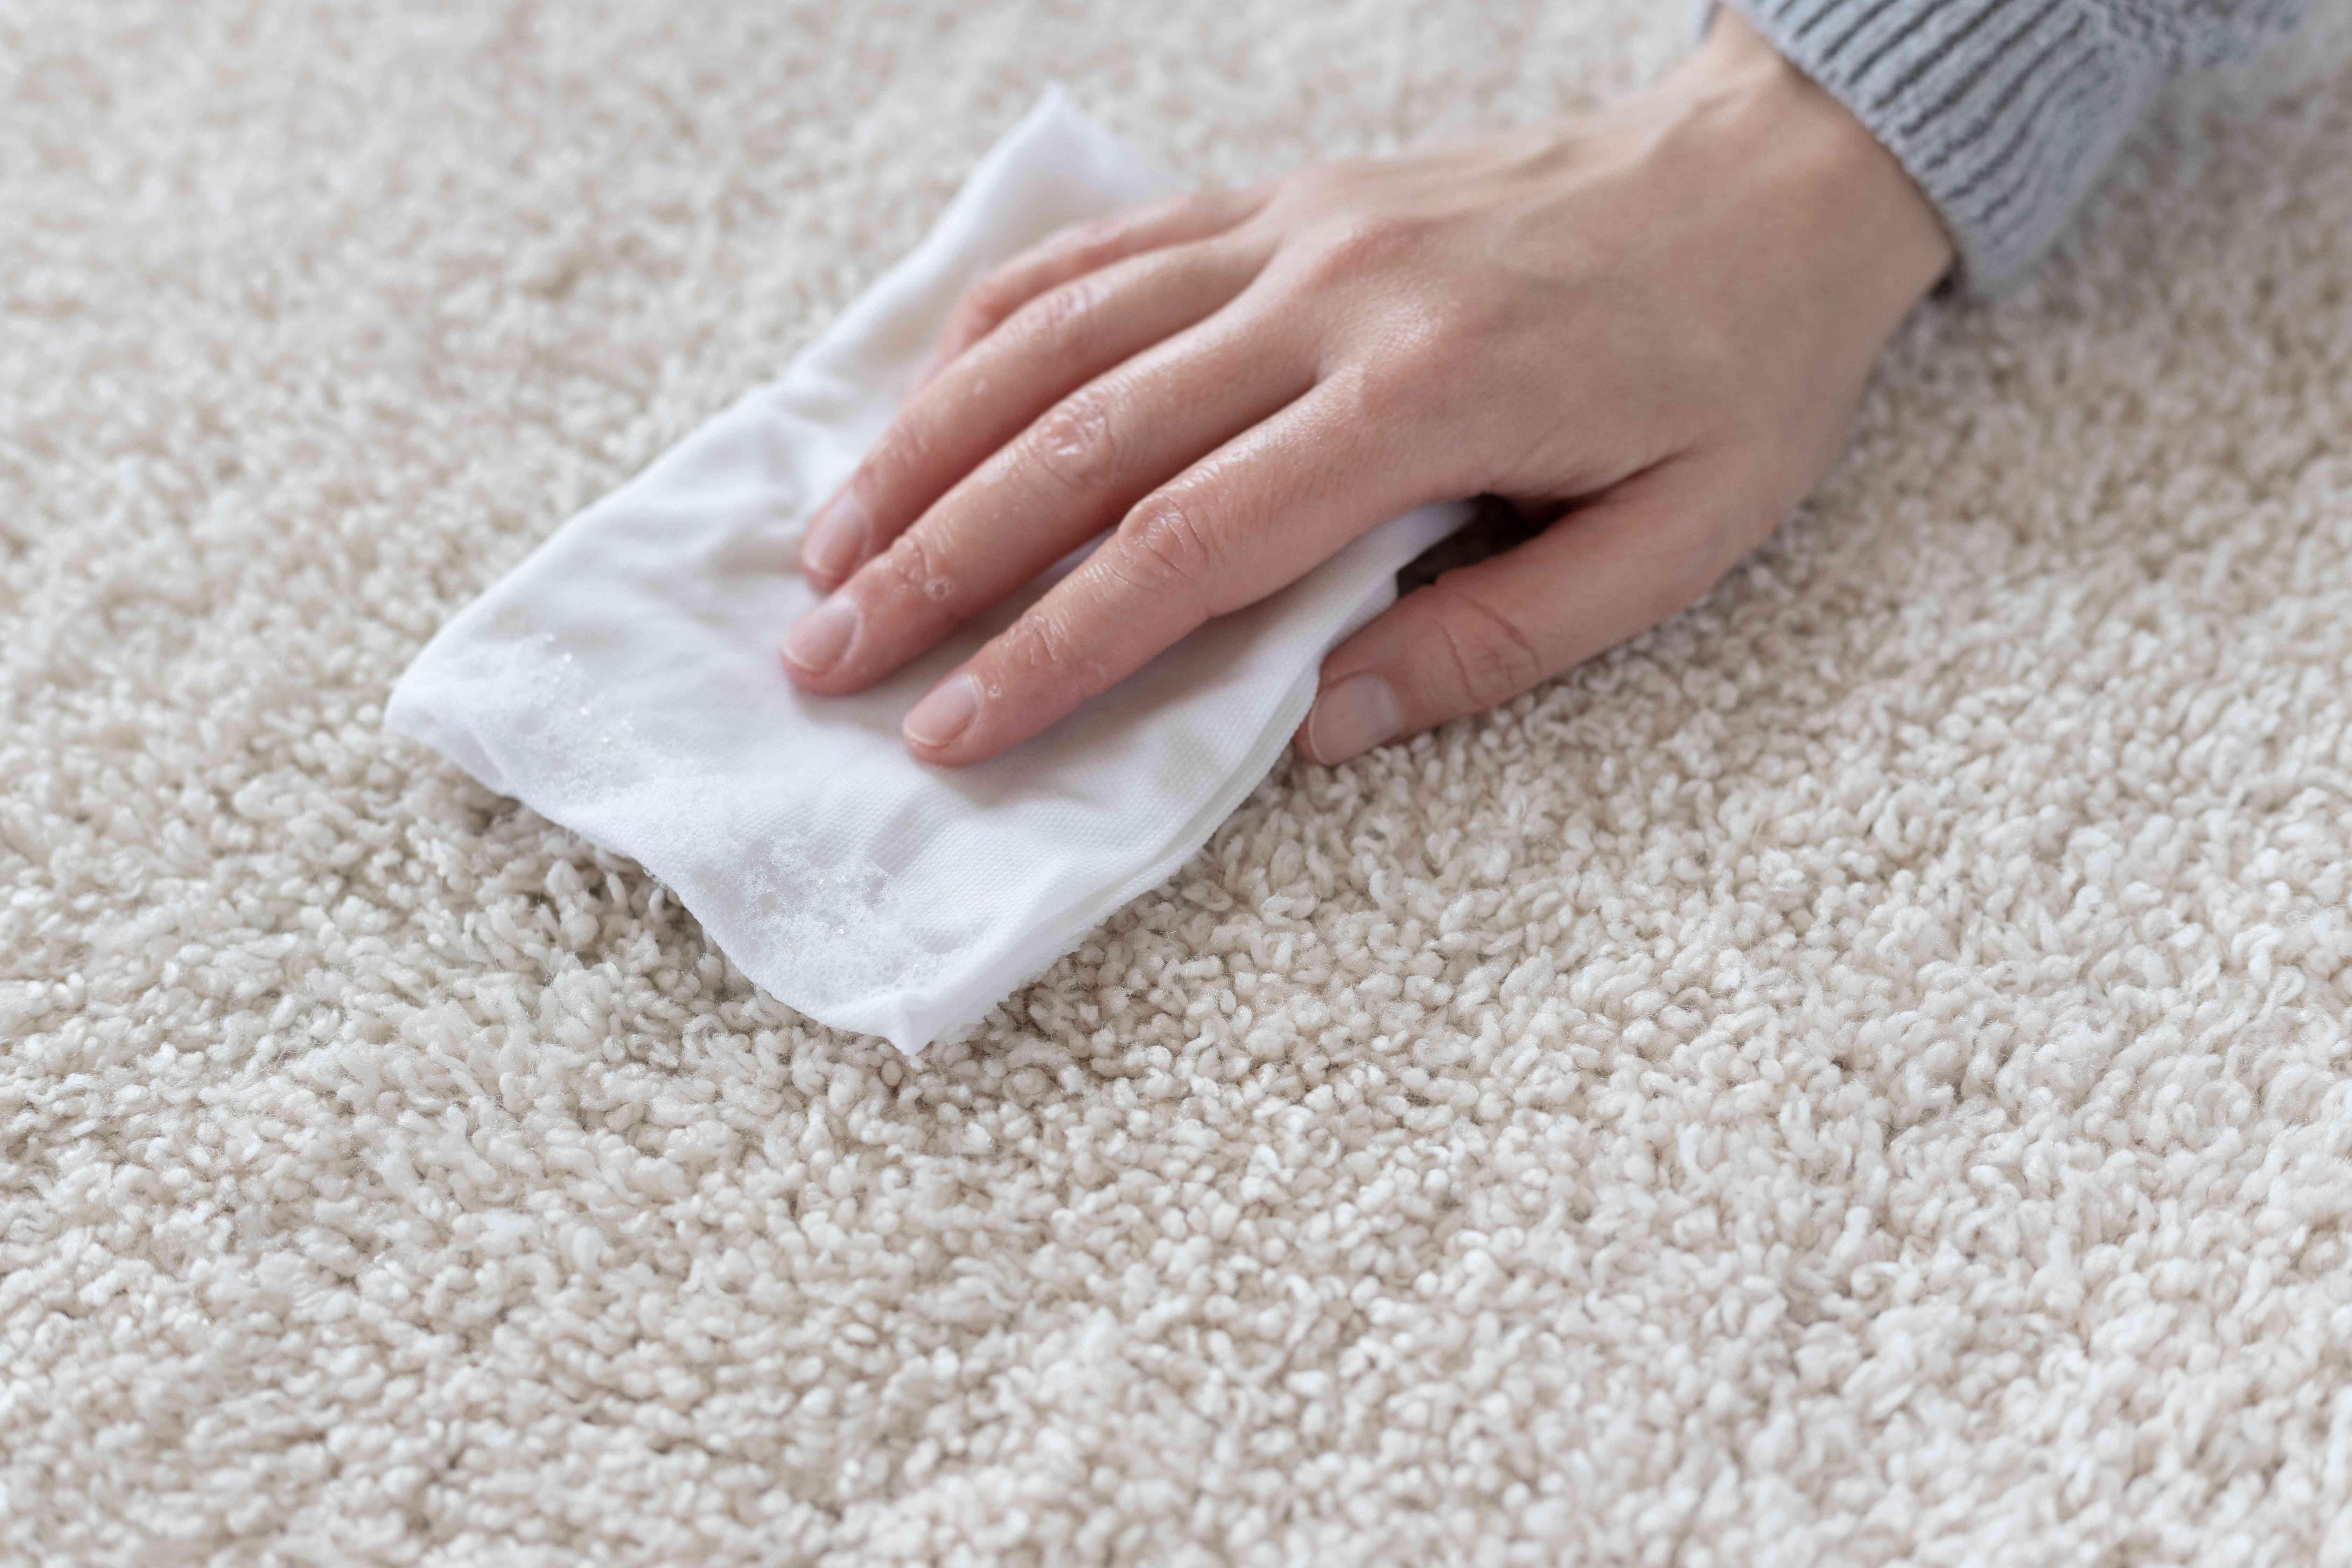 White paper towel blotting carpet with easter egg stain